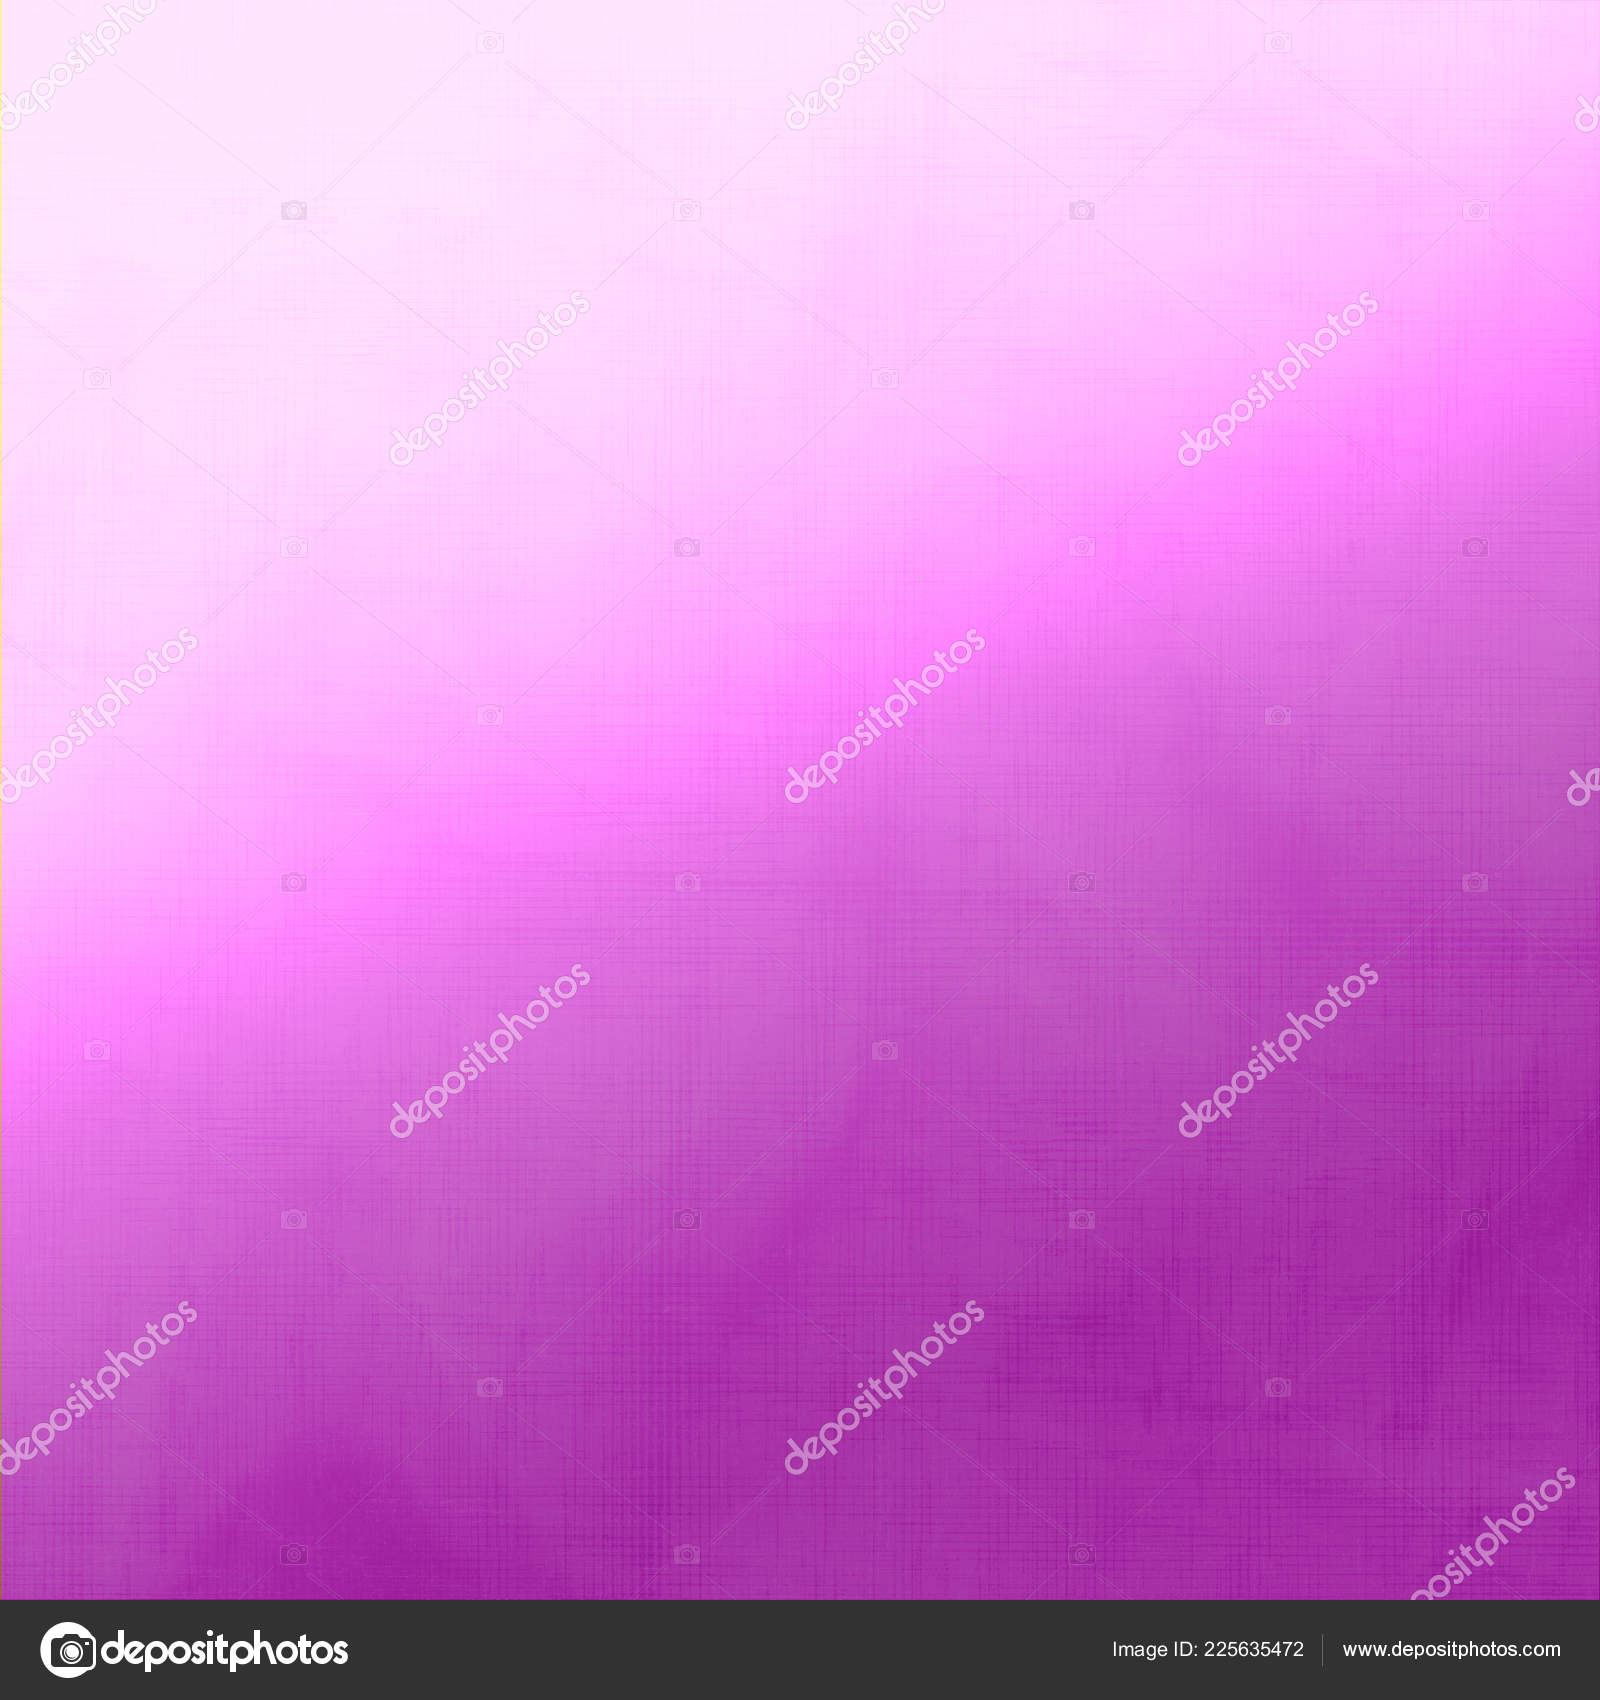 Fotografie Gradient Texture Pink Texture Sfondo Sfumato Rosa